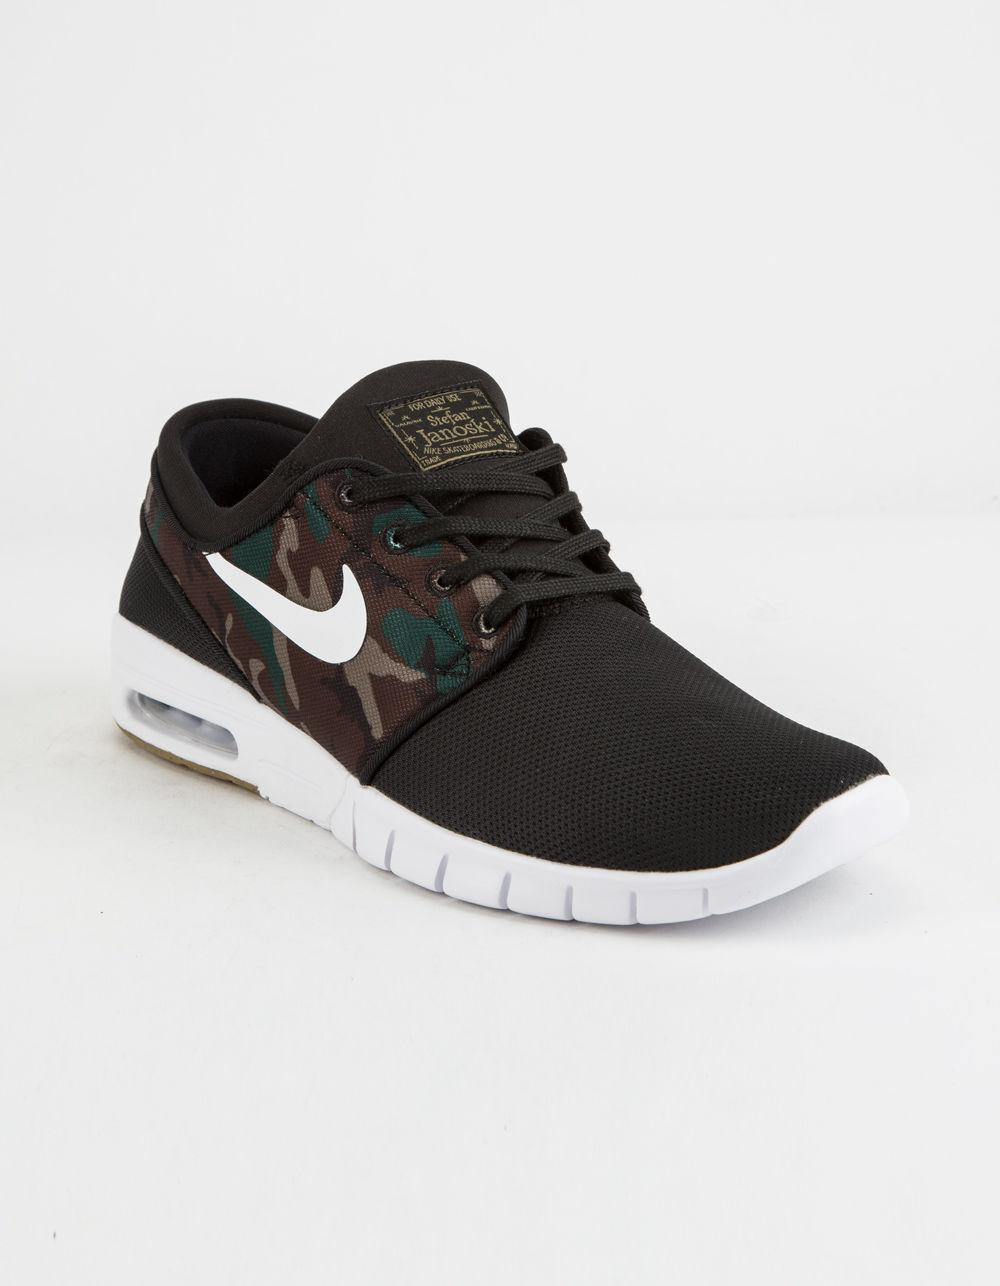 6c147058541d Lyst - Nike Stefan Janoski Max Black   White-medium Olive Shoes in Black  for Men